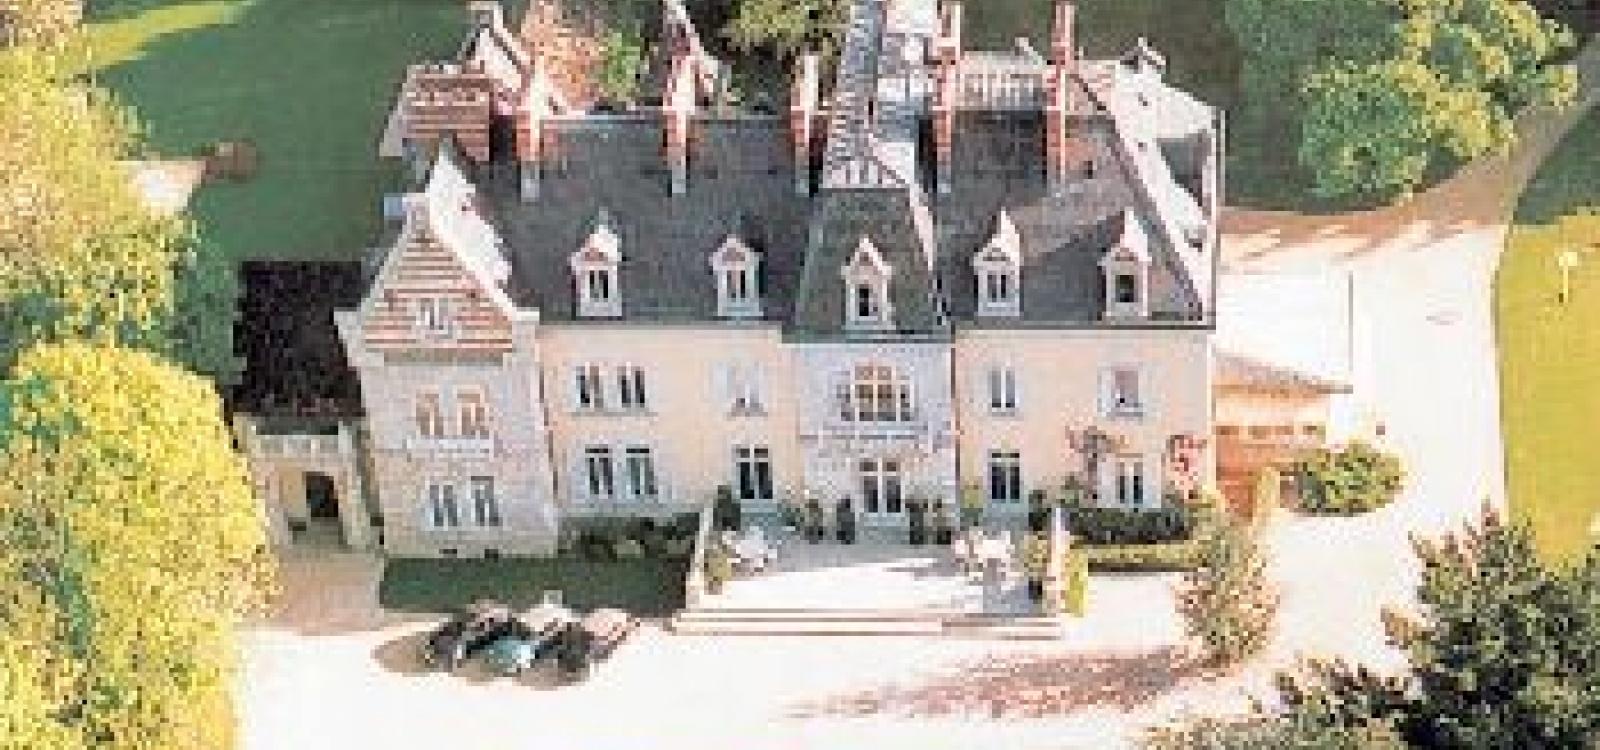 Dijon,France,1 chambre Bedrooms,1 la Salle de bainBathrooms,Château,1004